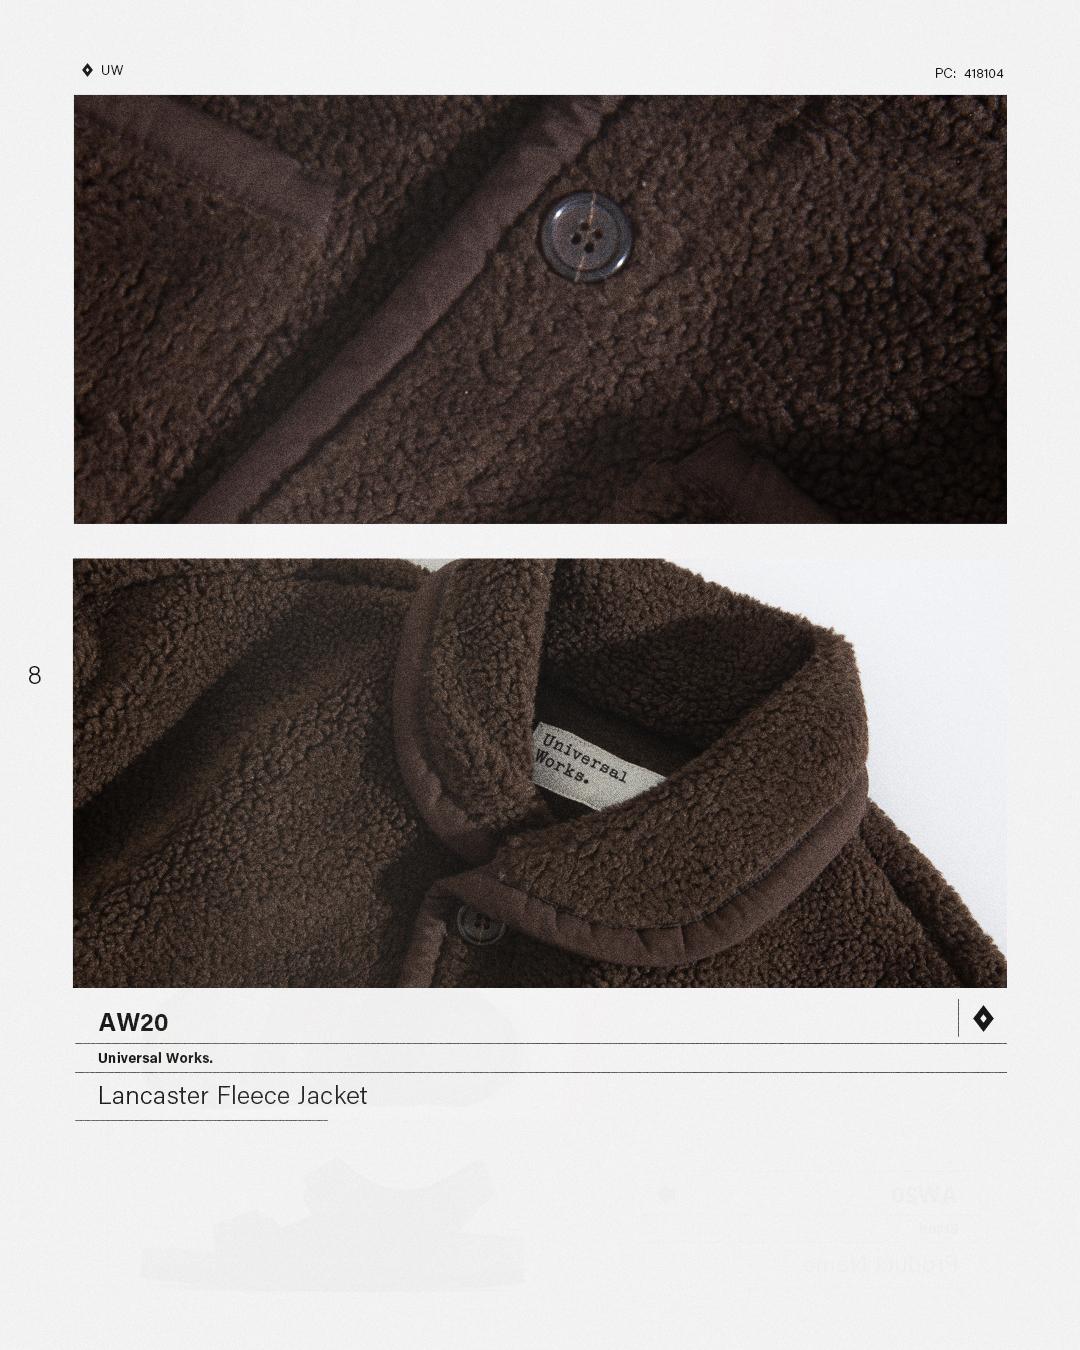 HIP Staff Picks: Universal Works AW20 Lancaster Fleece Jacket